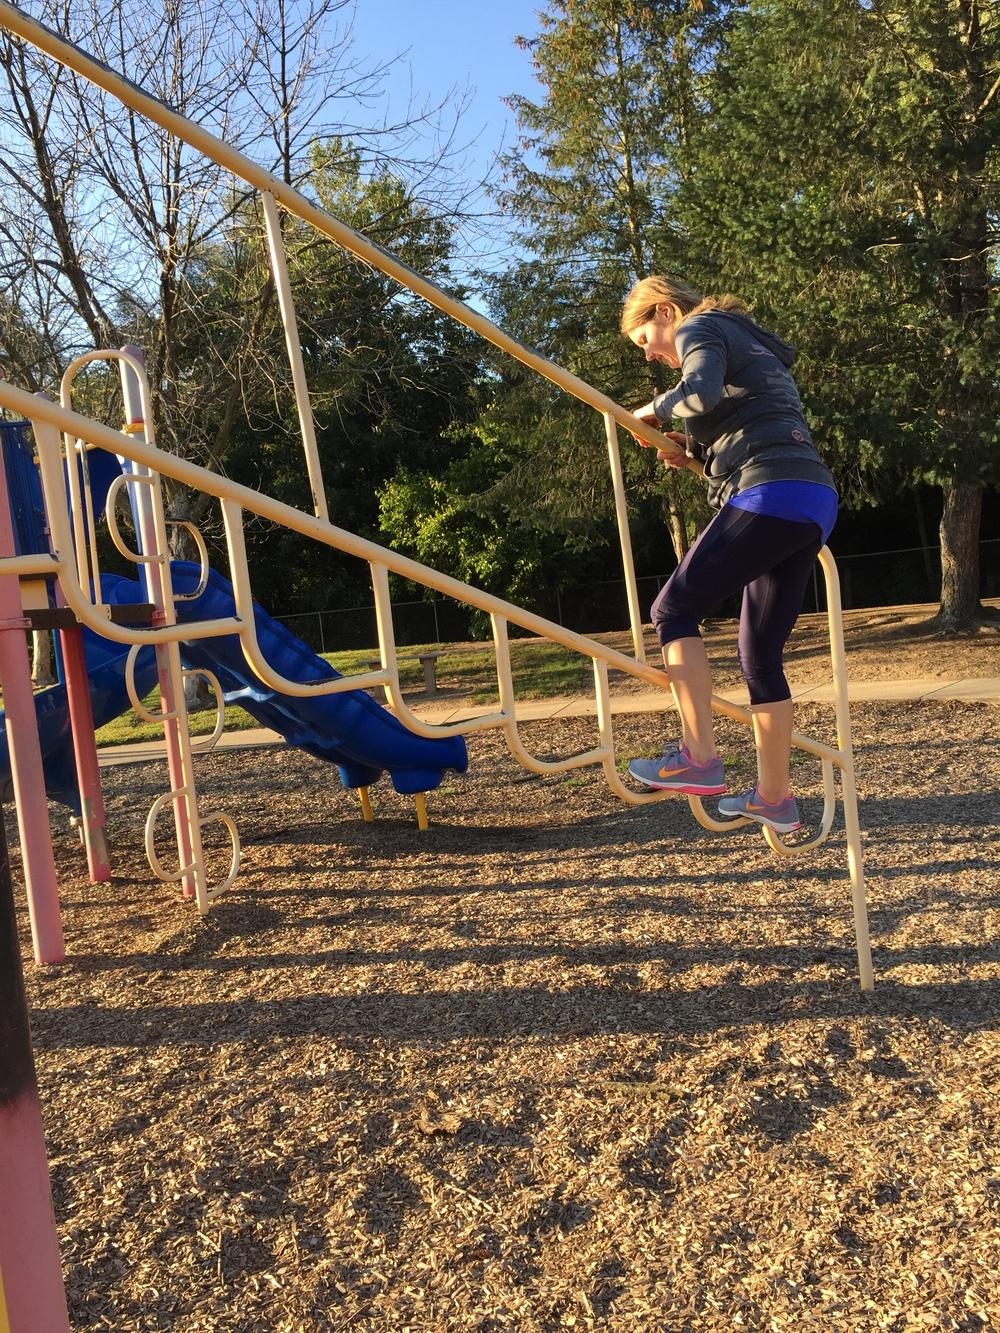 Climbing Apparatus